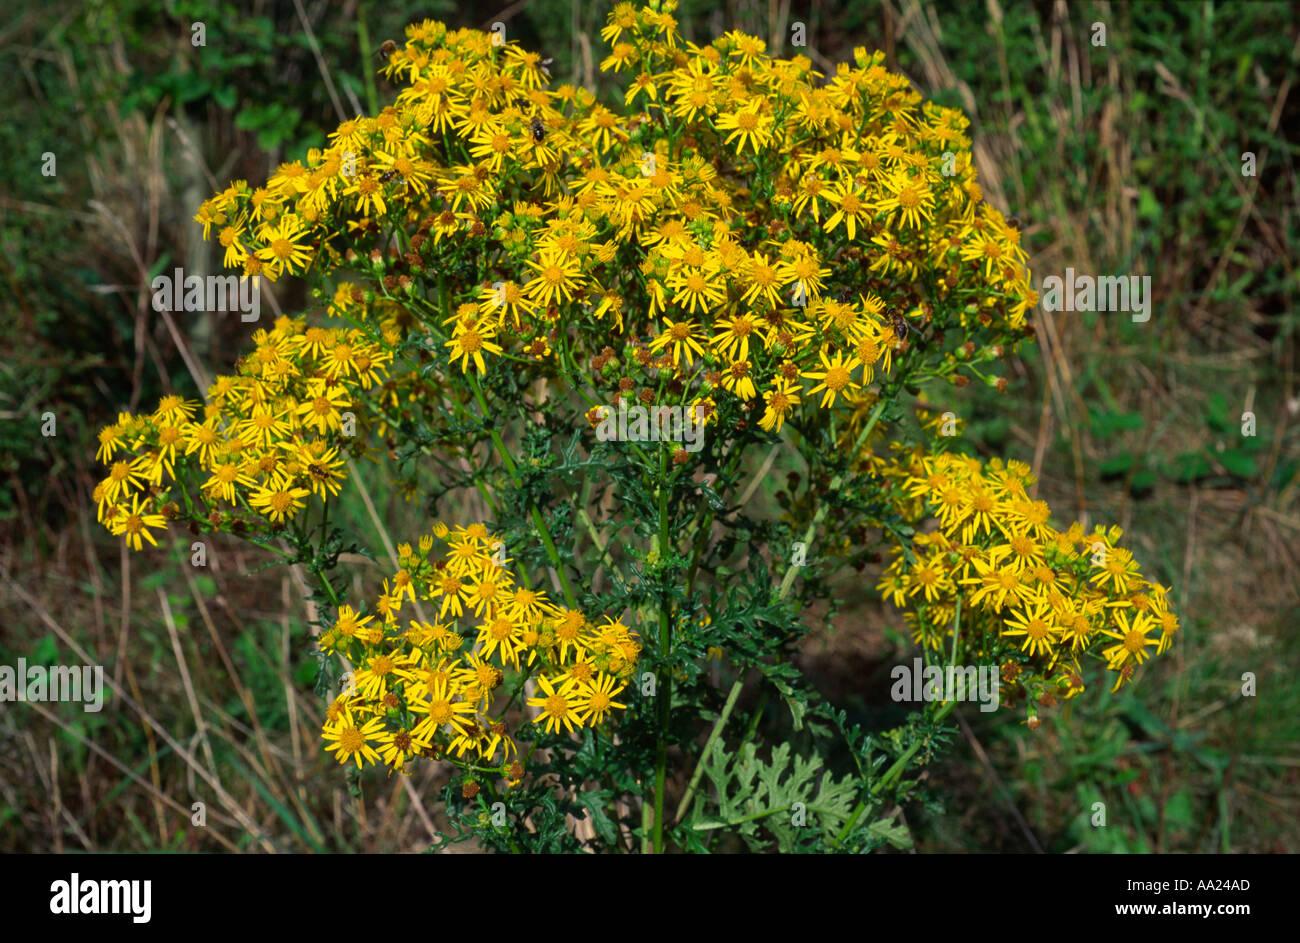 Ragwort Plant In Flower Senecio Jacobea This Plant Is Poisonous To